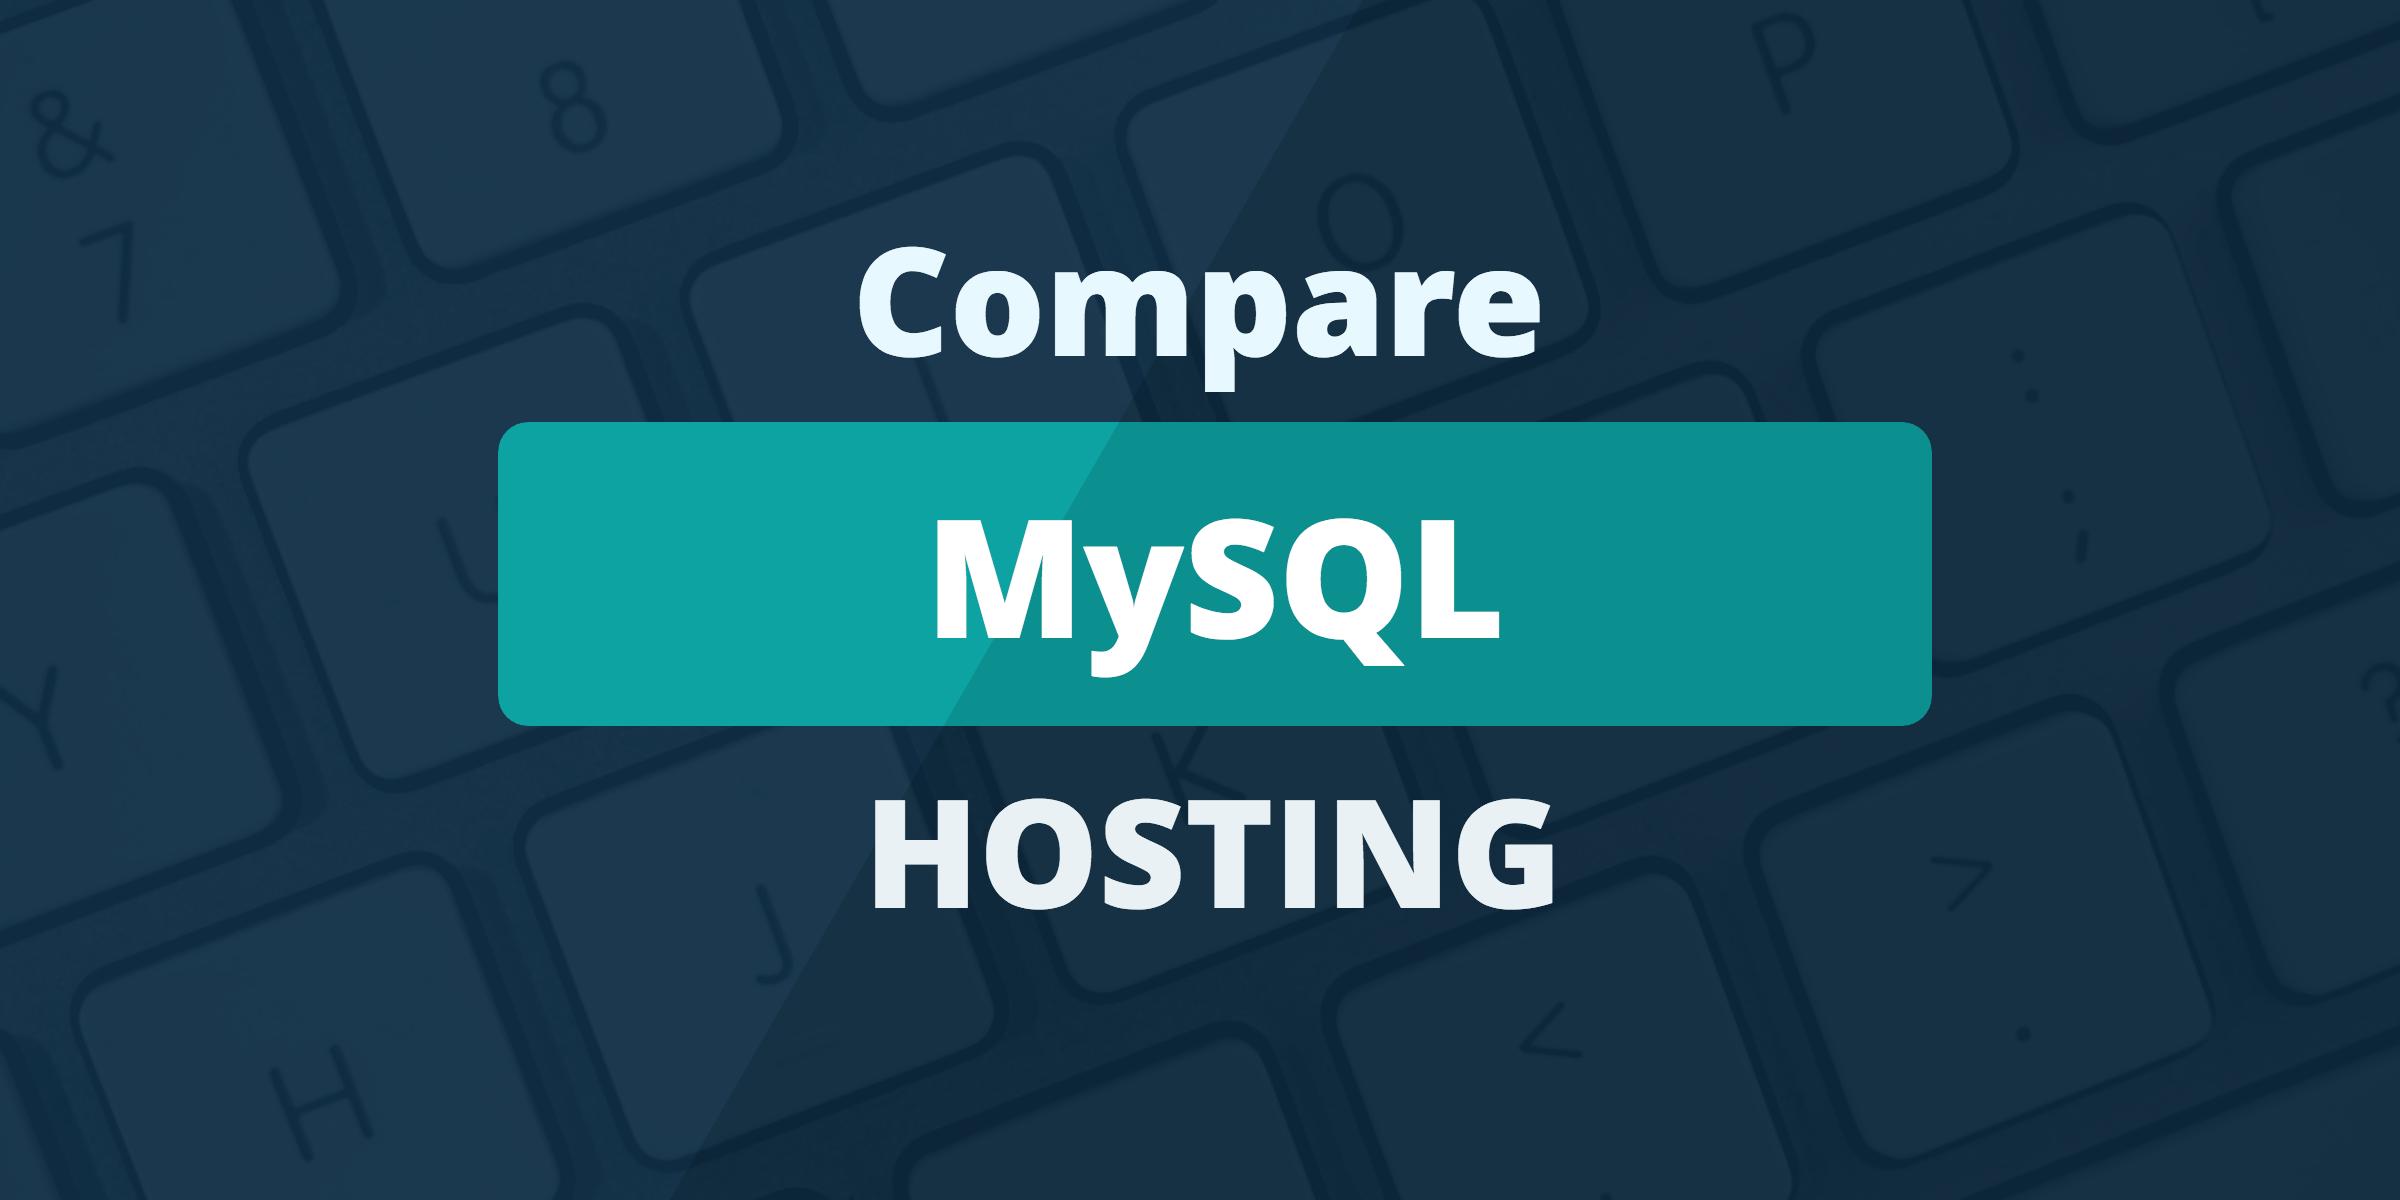 compare mysql hosting